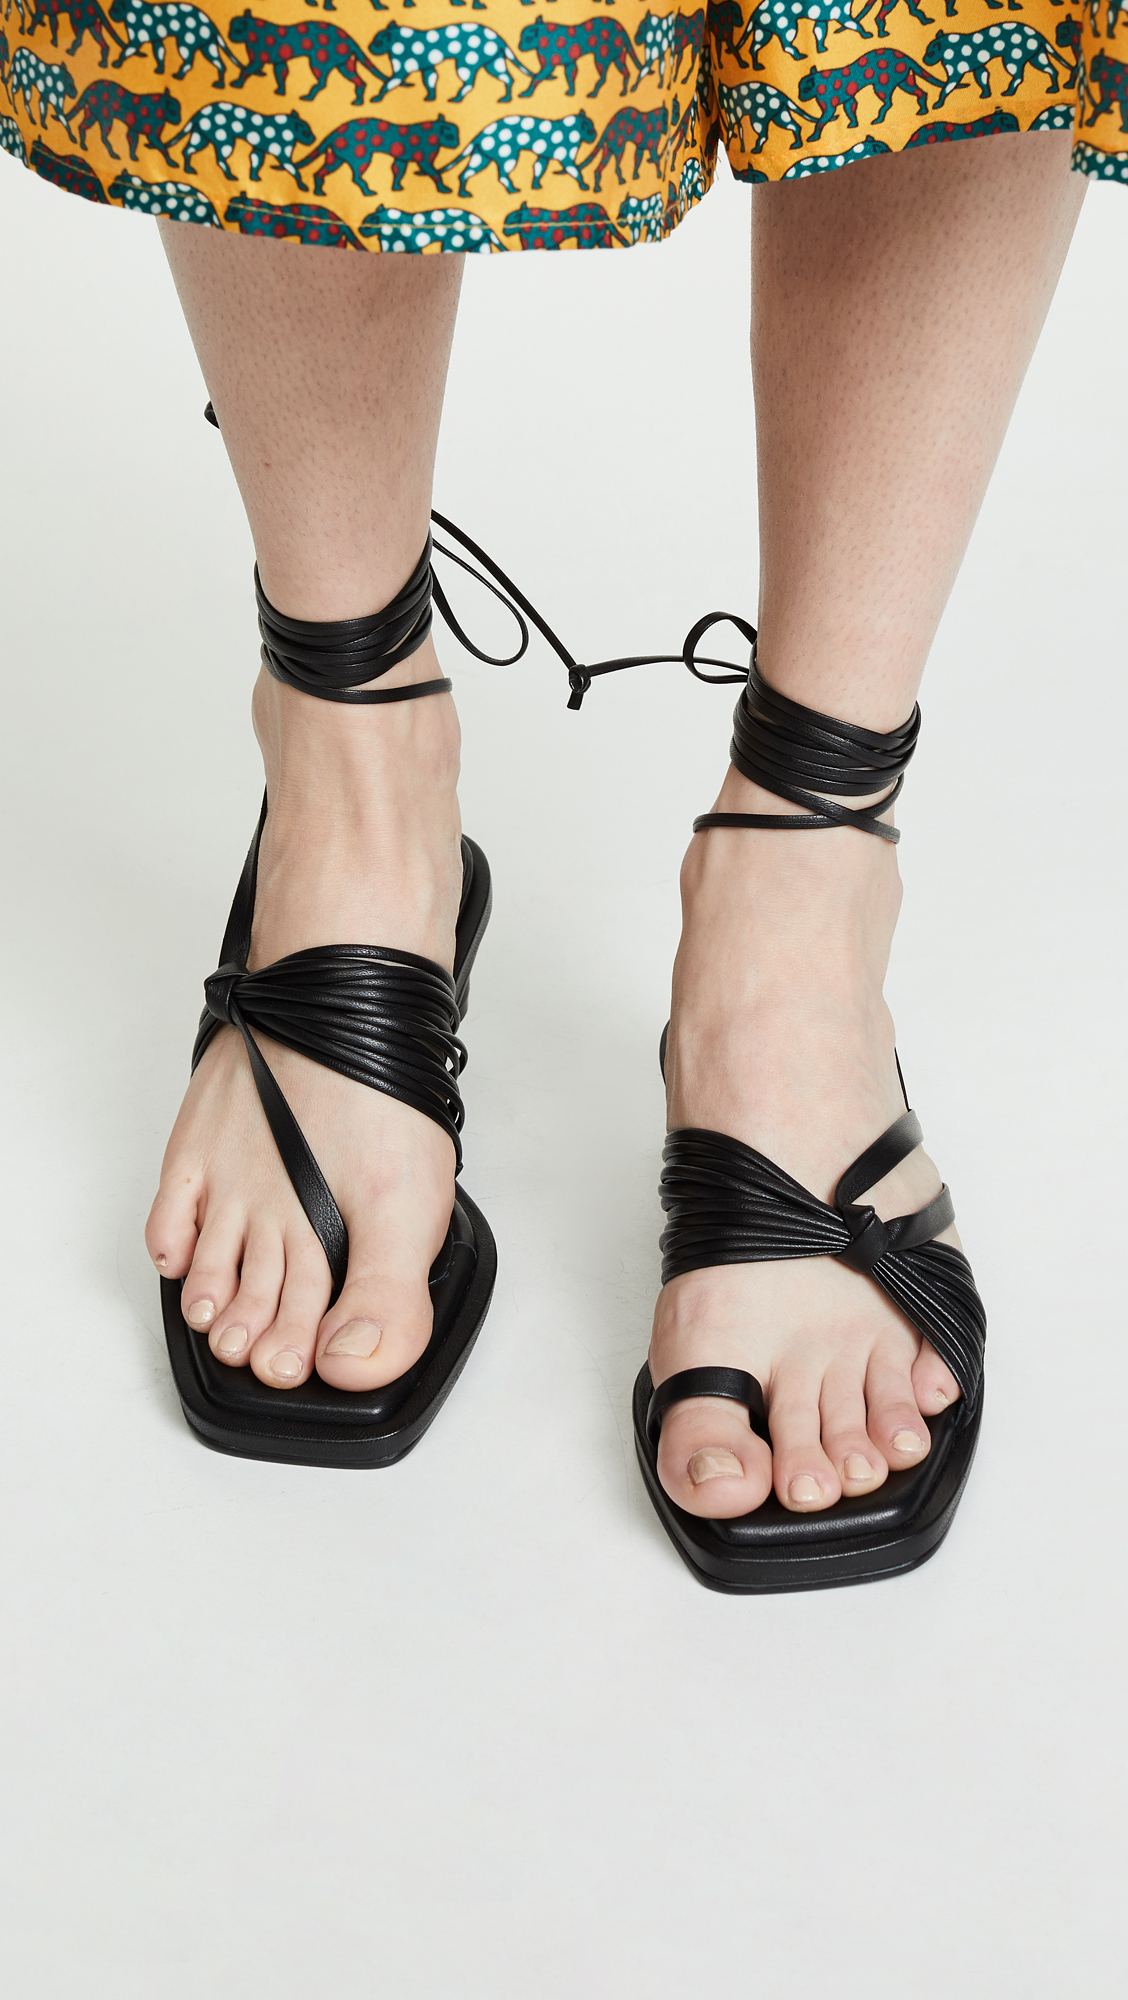 ed7c26e8dbeb Reike Nen Unbalanced String Flip Flops